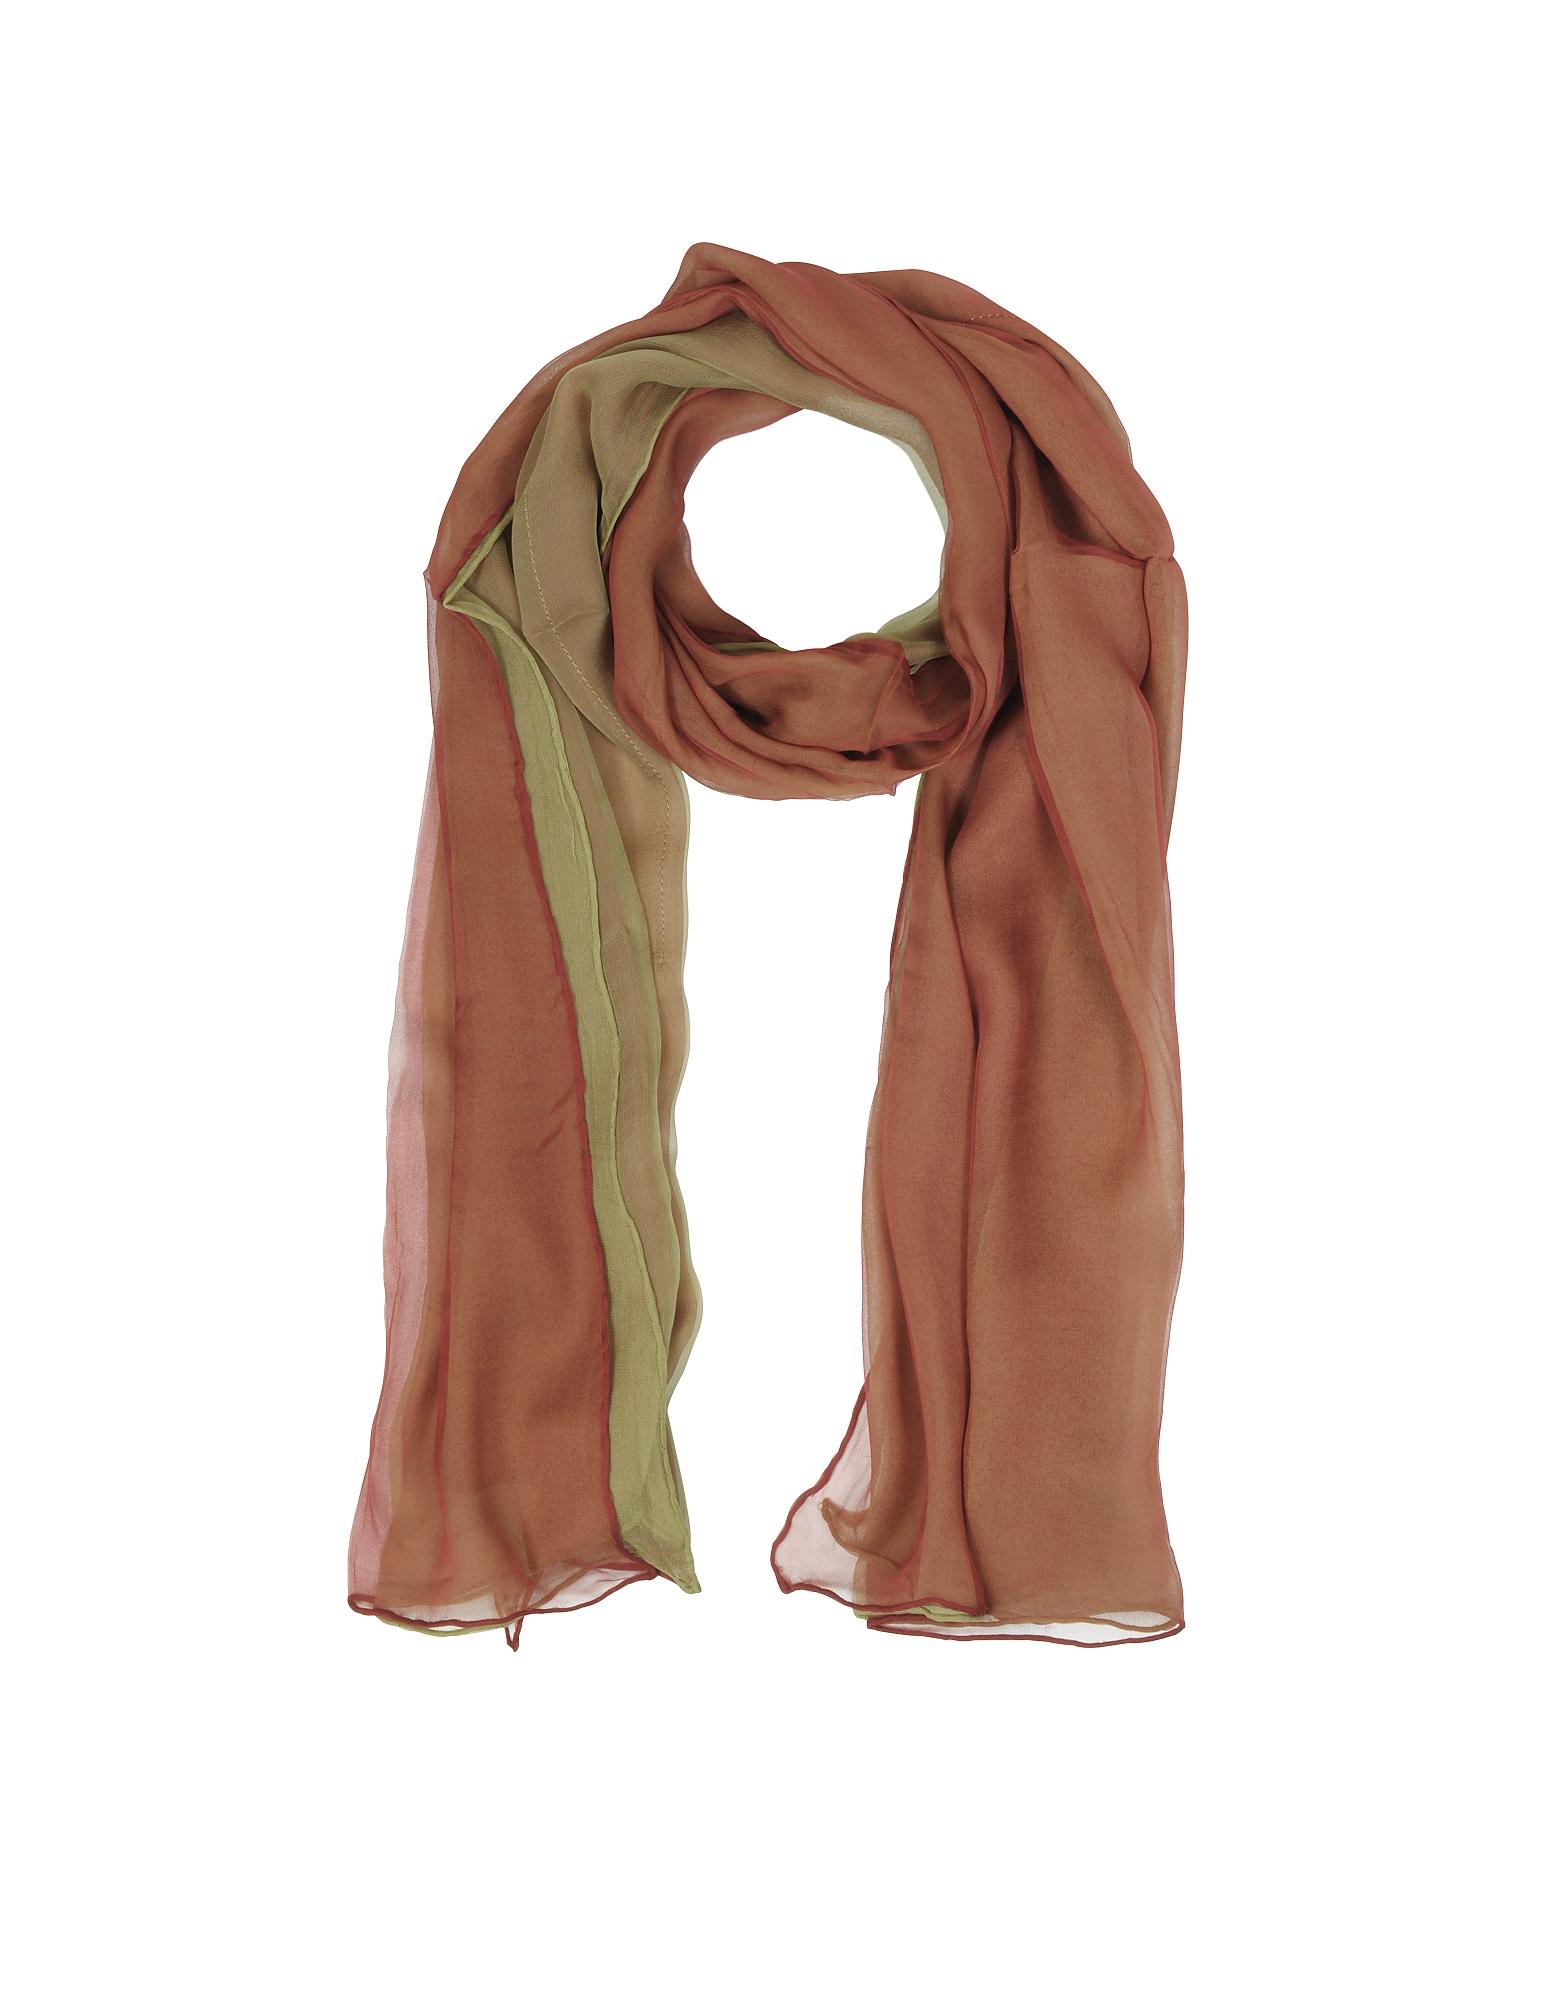 Laura Biagiotti Long Scarves, Gradient Burgundy/Light Green Silk Long Scarf